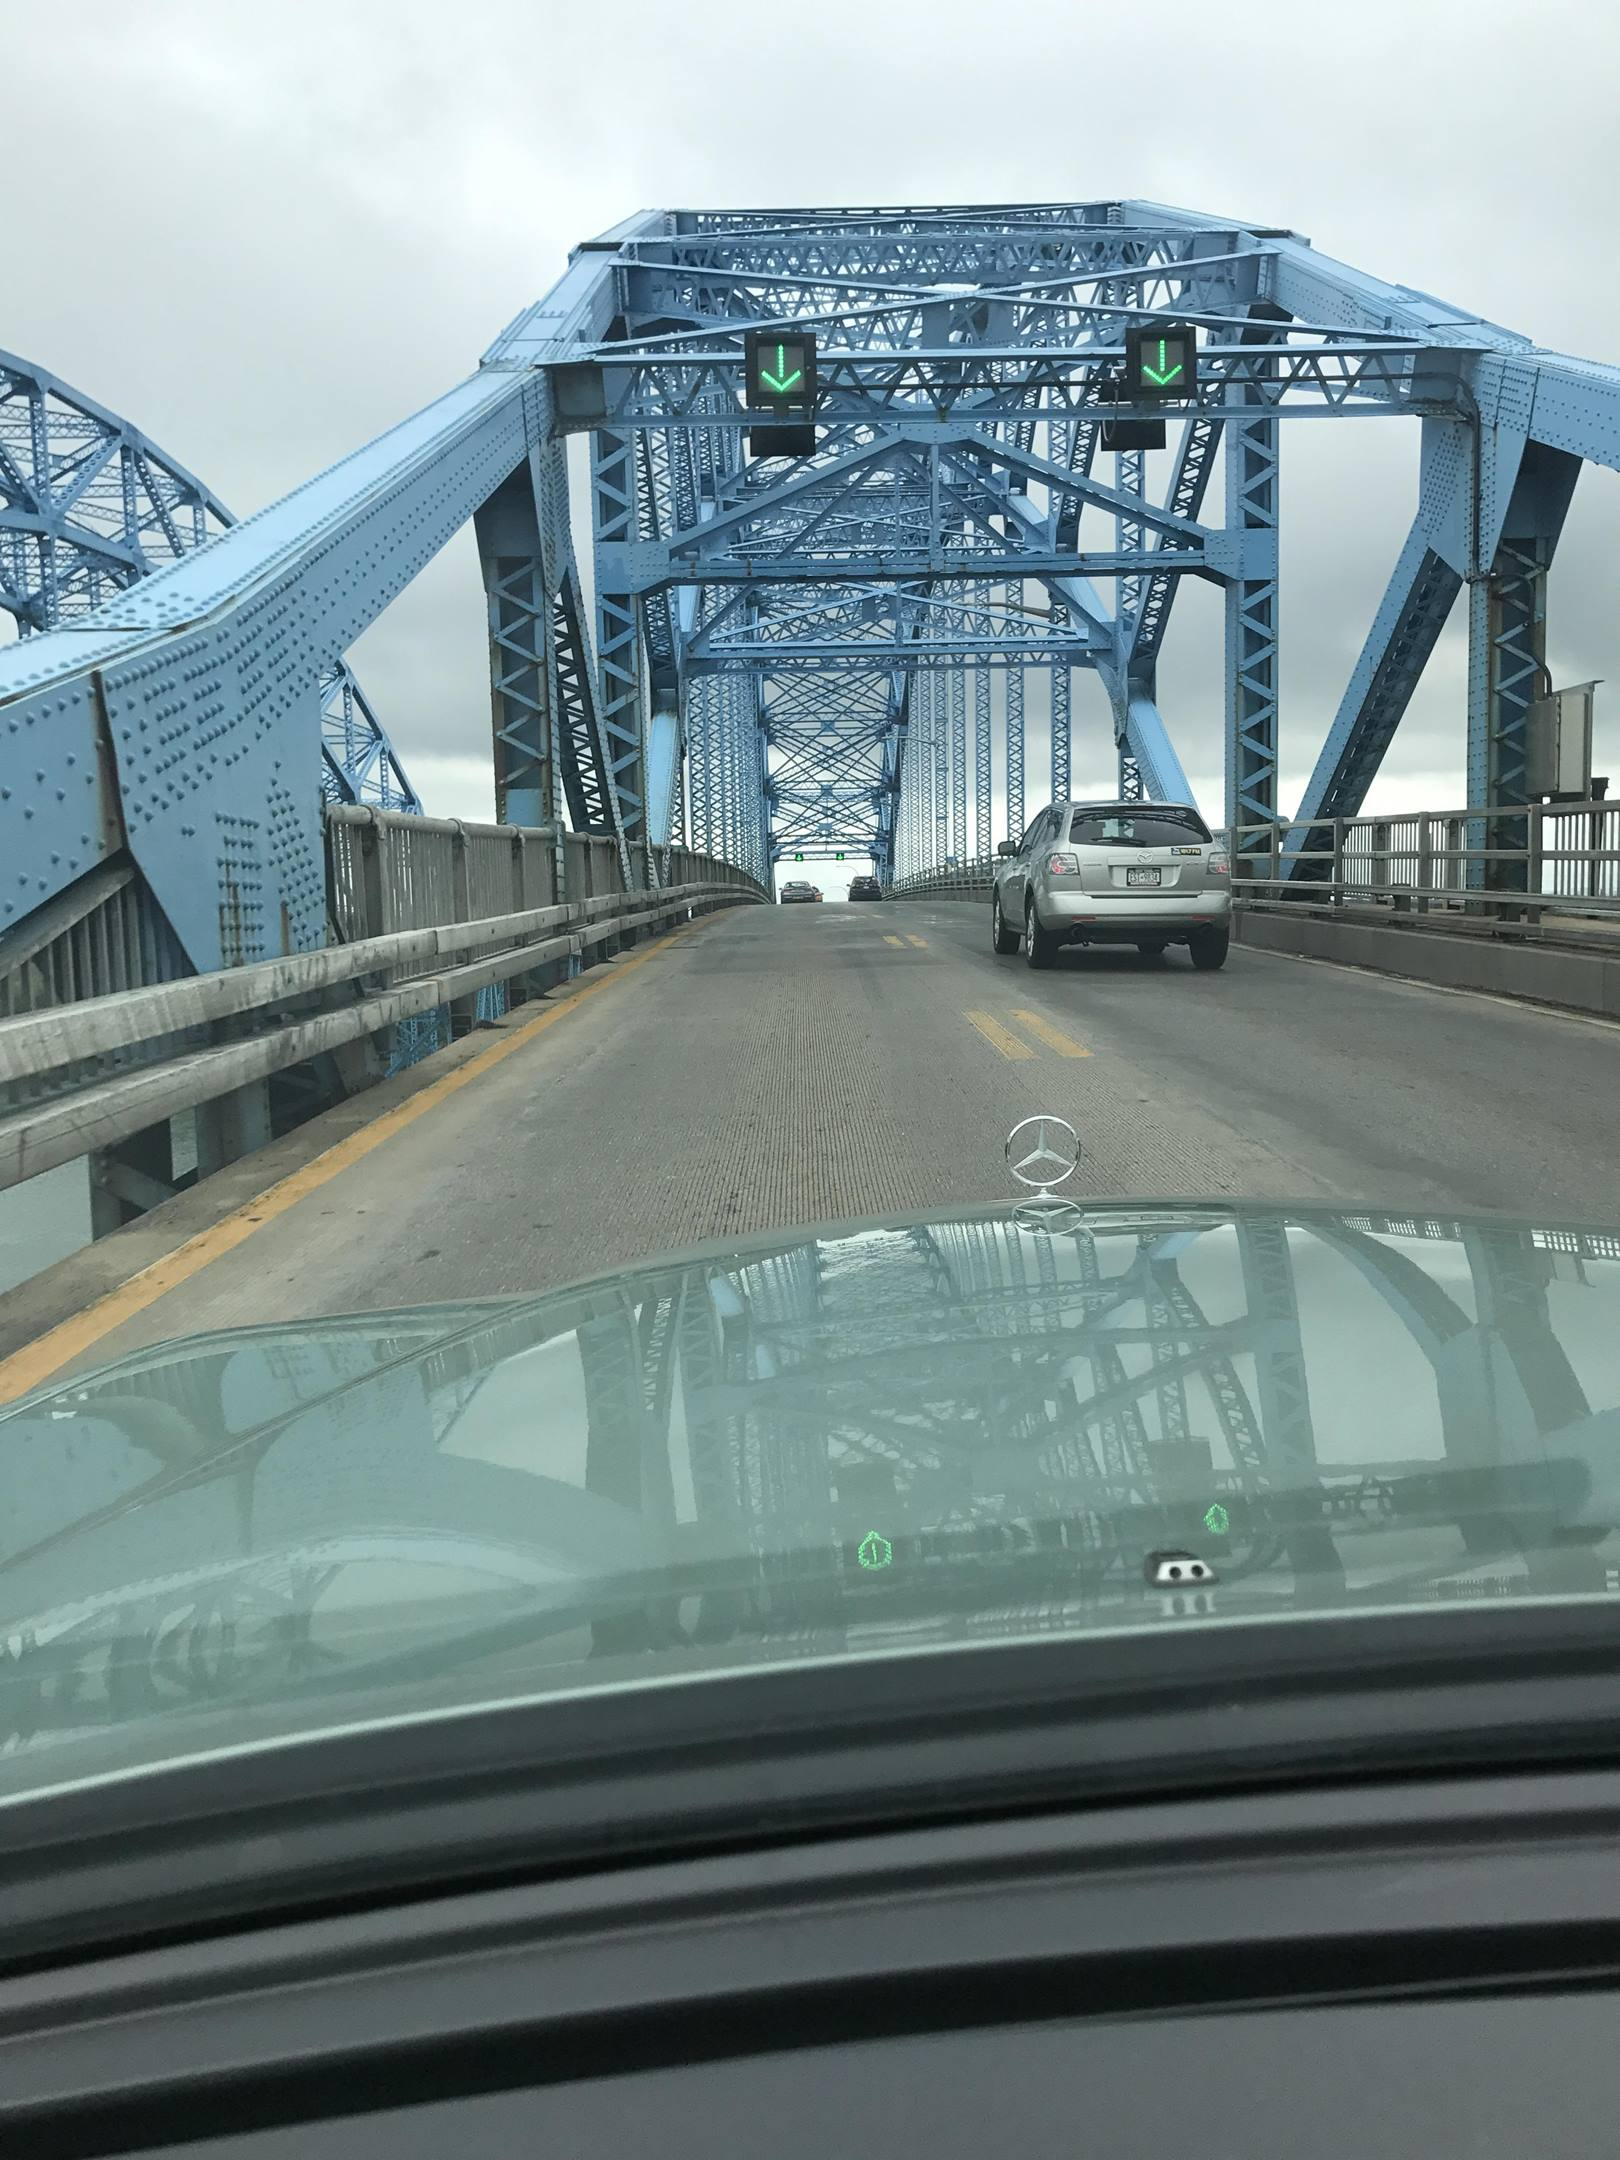 crossing the bridge into the United States